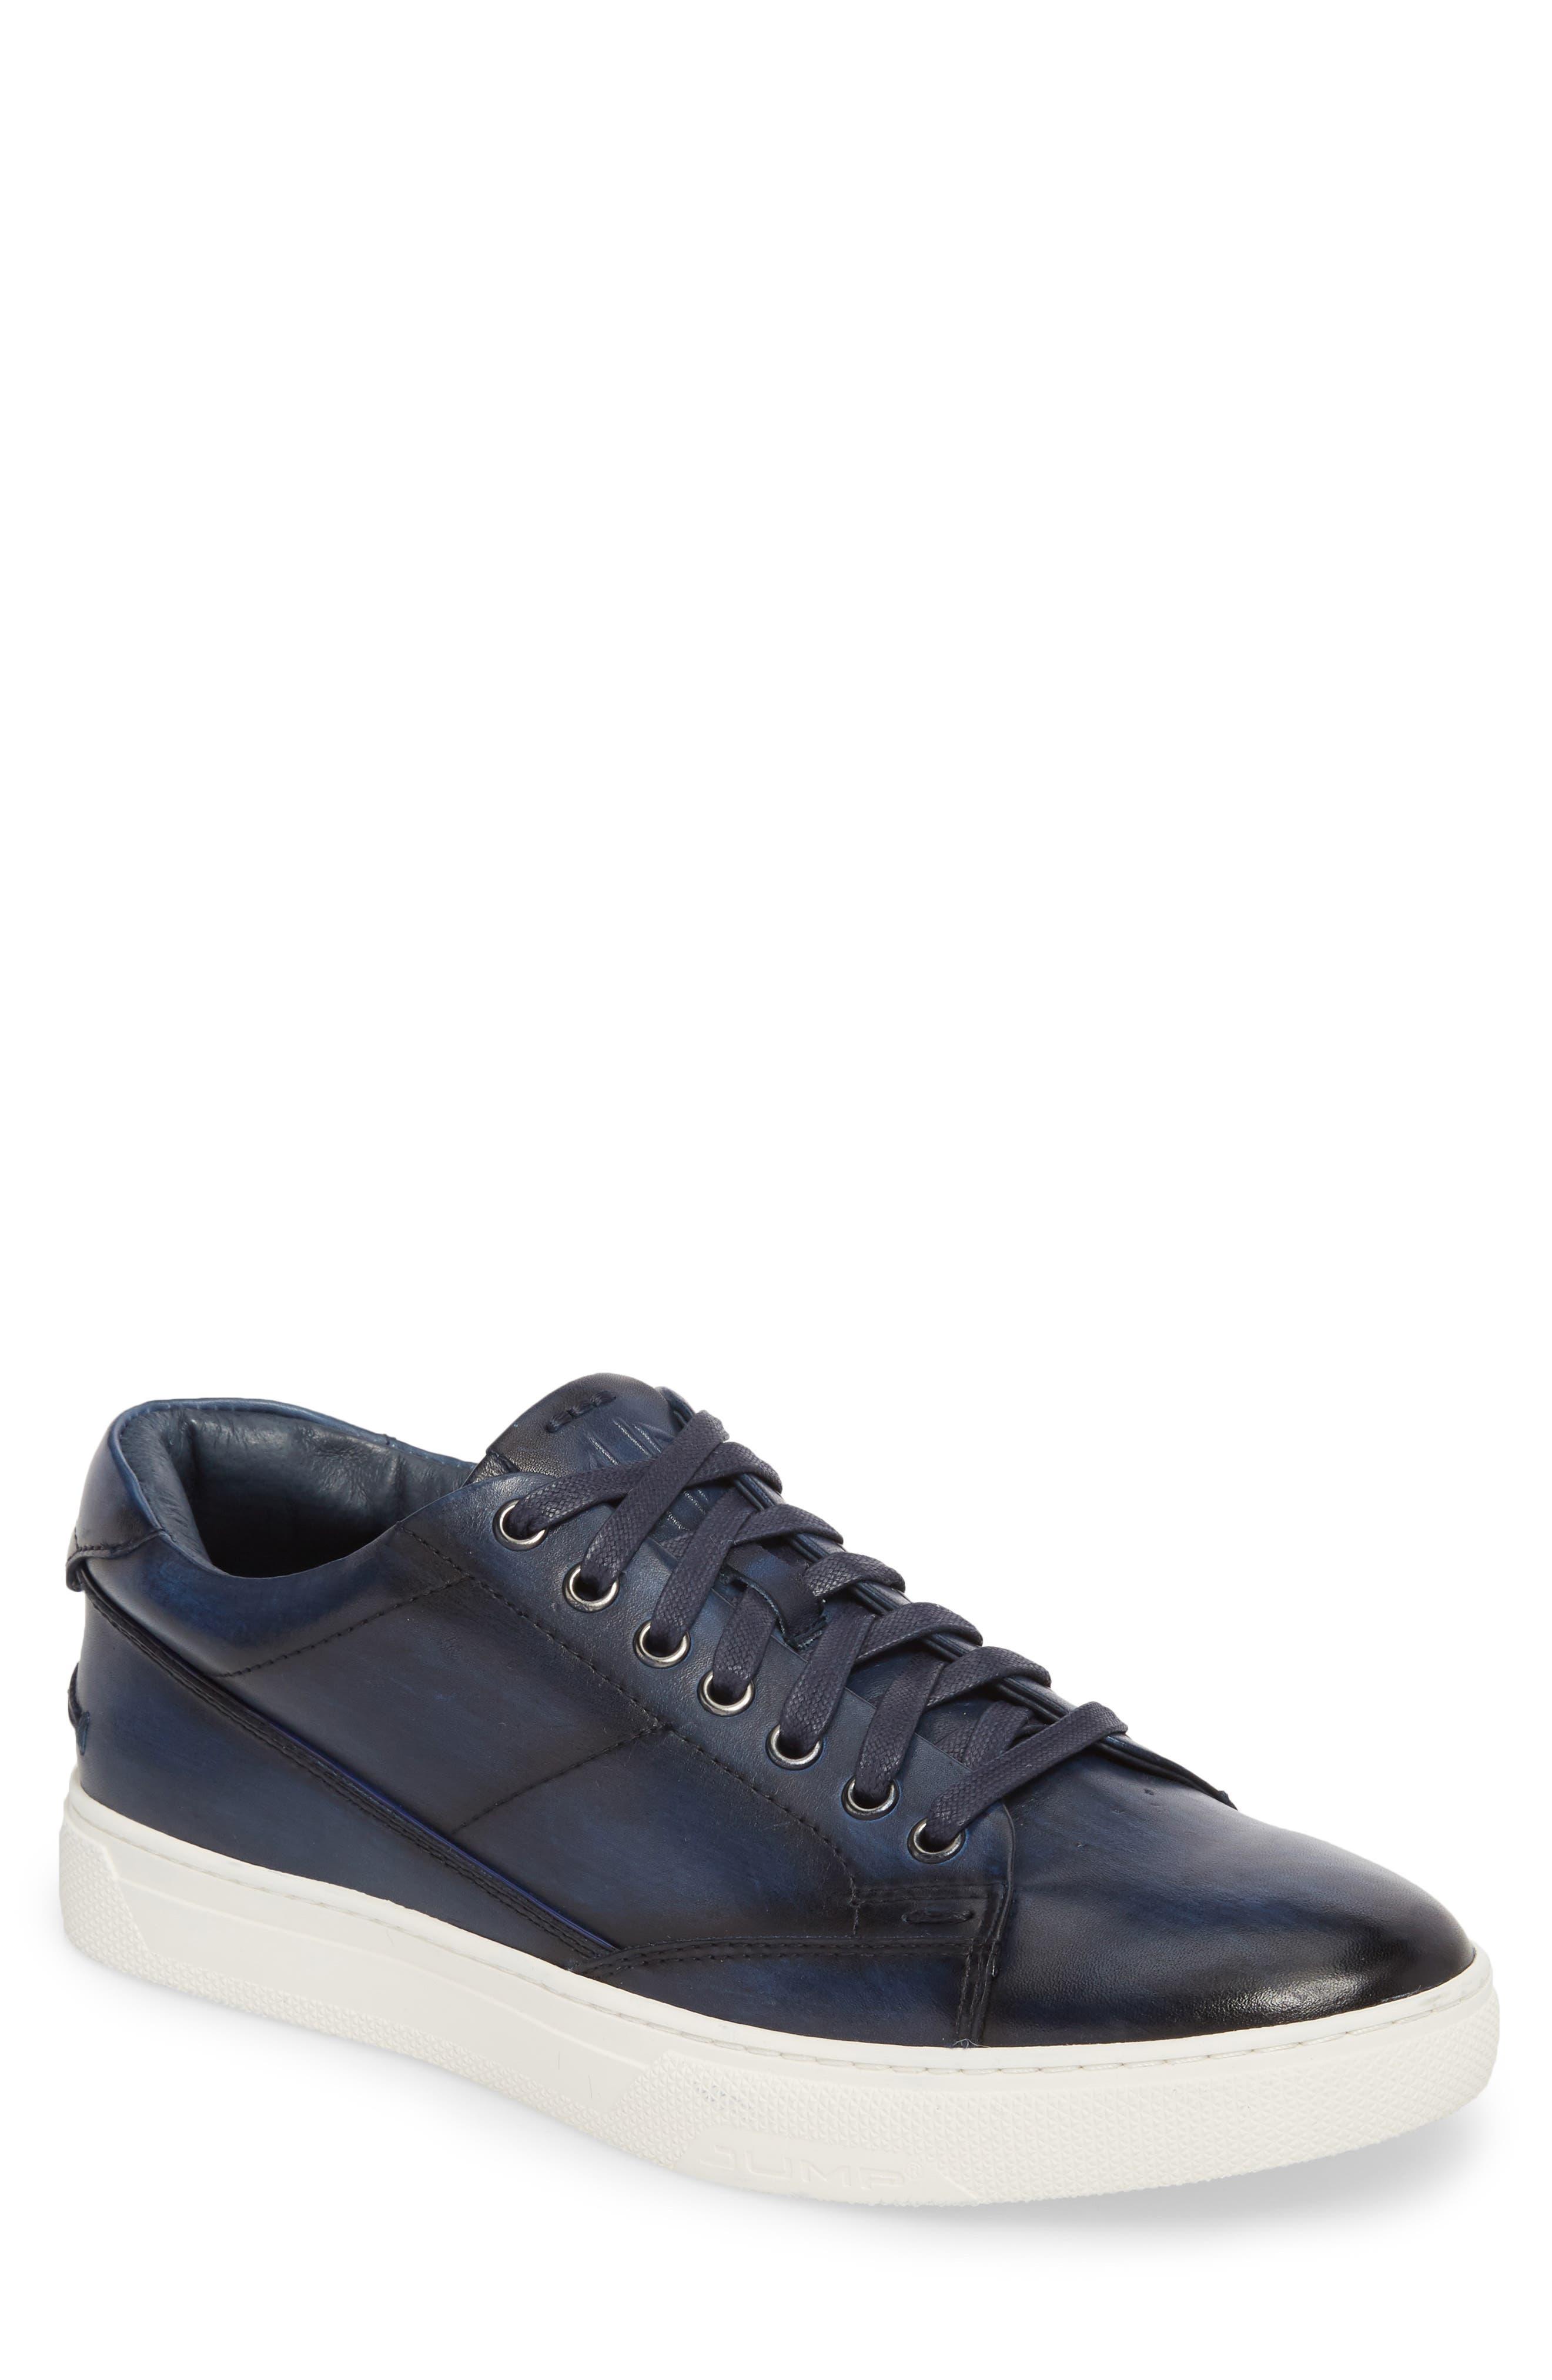 Jump Sweeney Low Top Sneaker, Blue